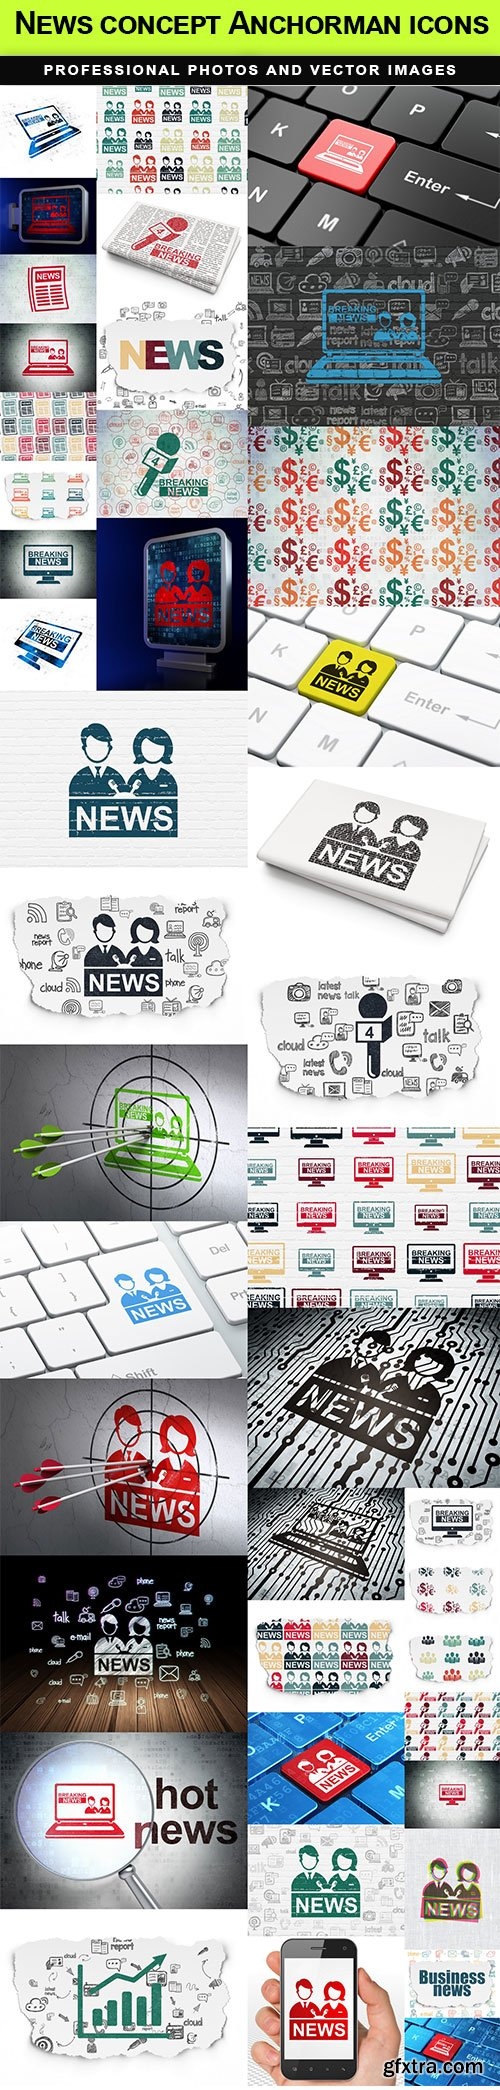 News concept Anchorman icons